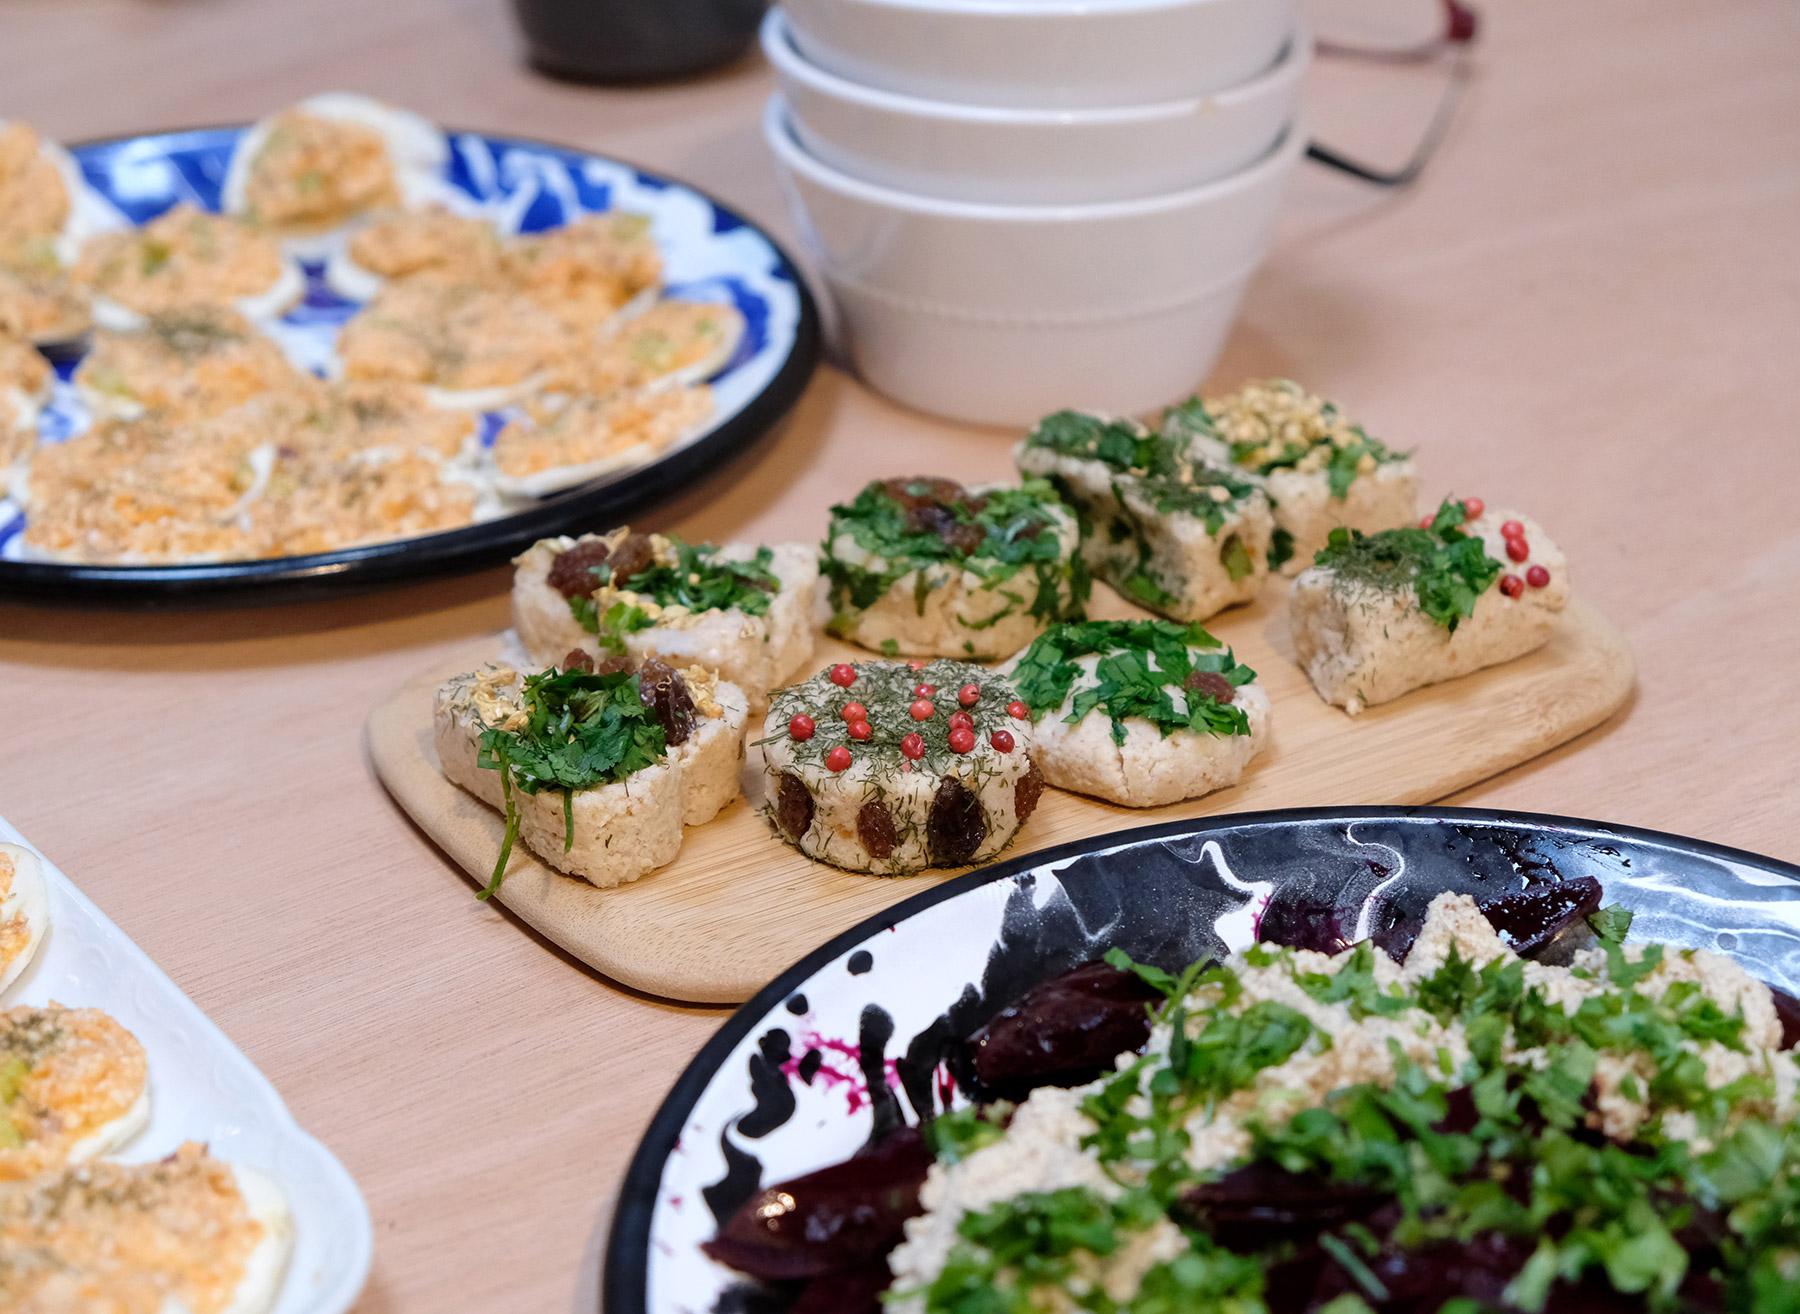 Atelier De La Cuisine Nantes blog-nantes-les-crawquantes-cuisine-crue-vegan15 - nantaise.fr